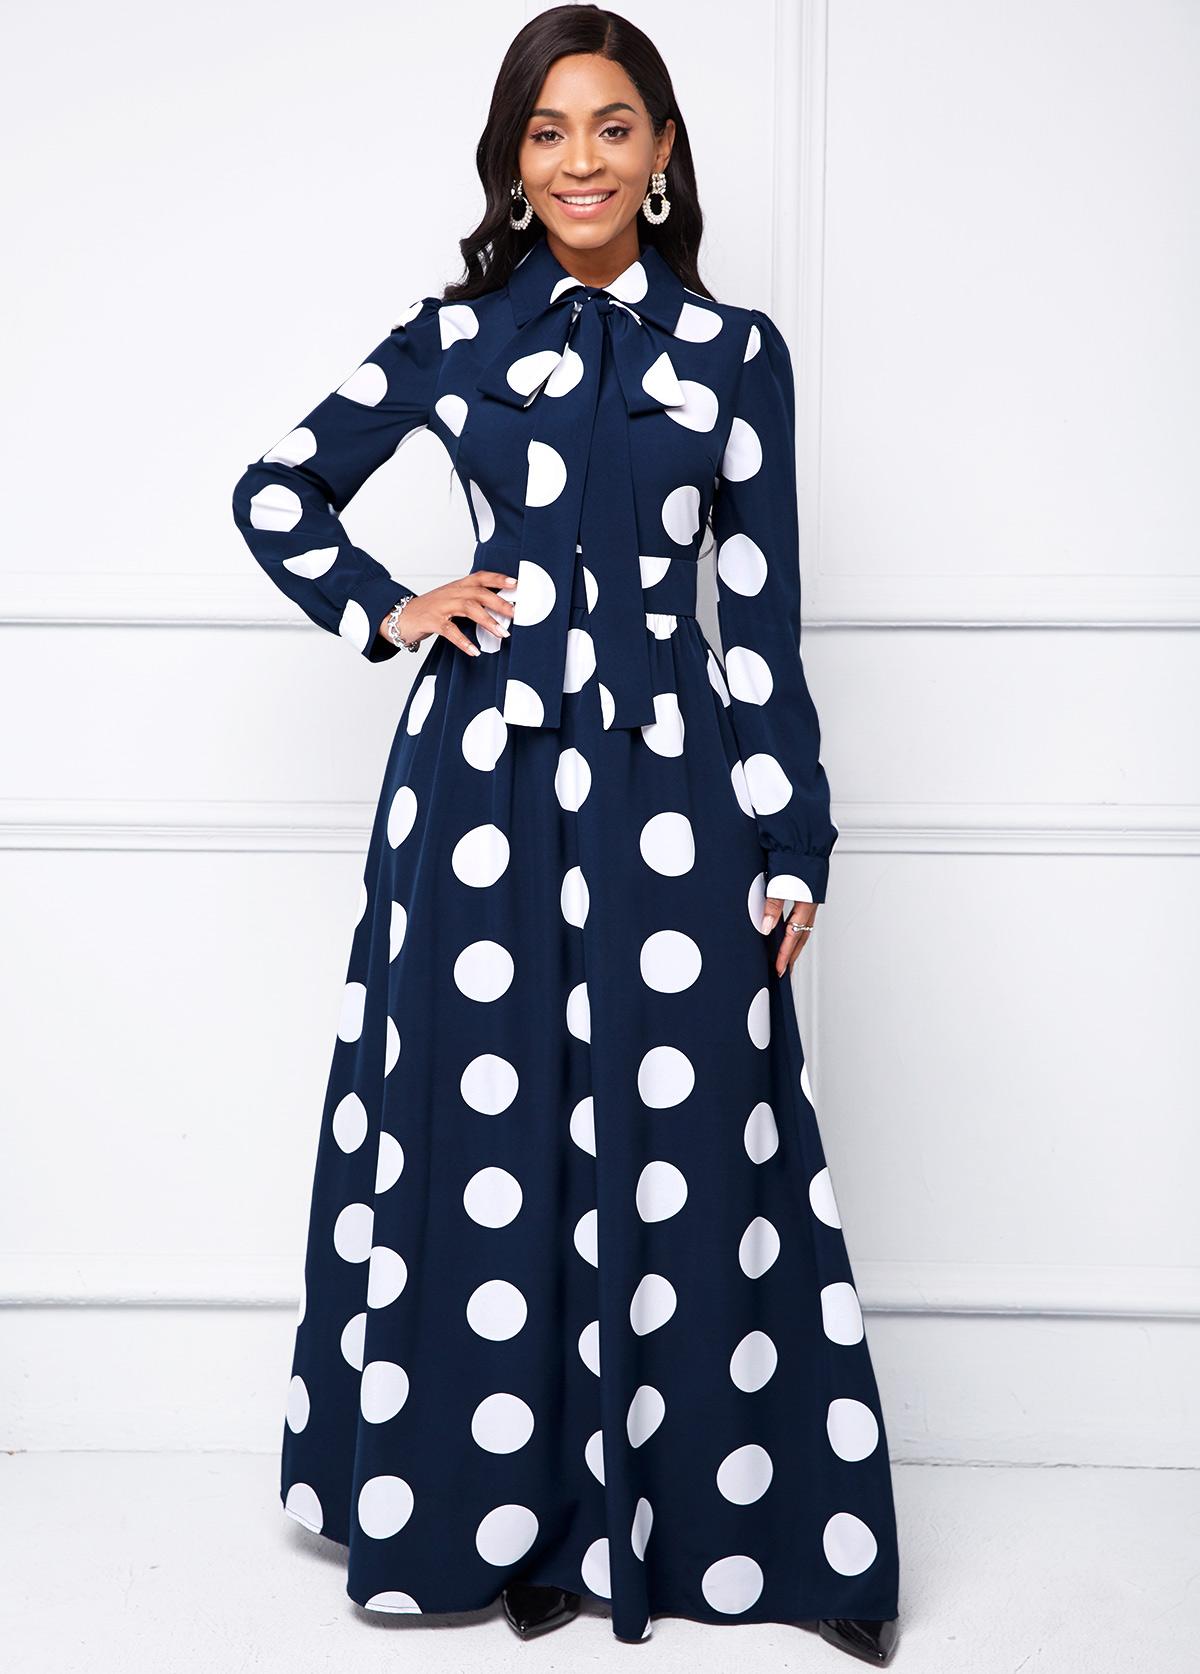 ROTITA Polka Dot Turndown Collar Long Sleeve Dress